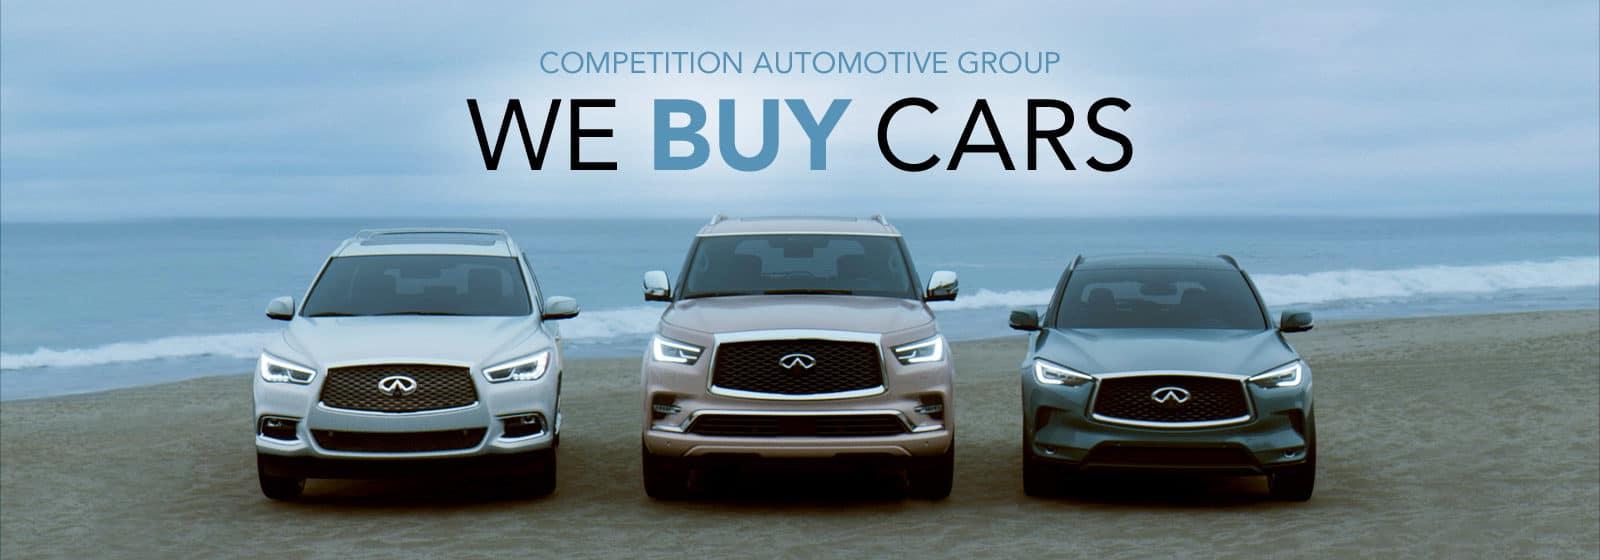 Homepage-Slider-INFINITI-We-Buy-Cars